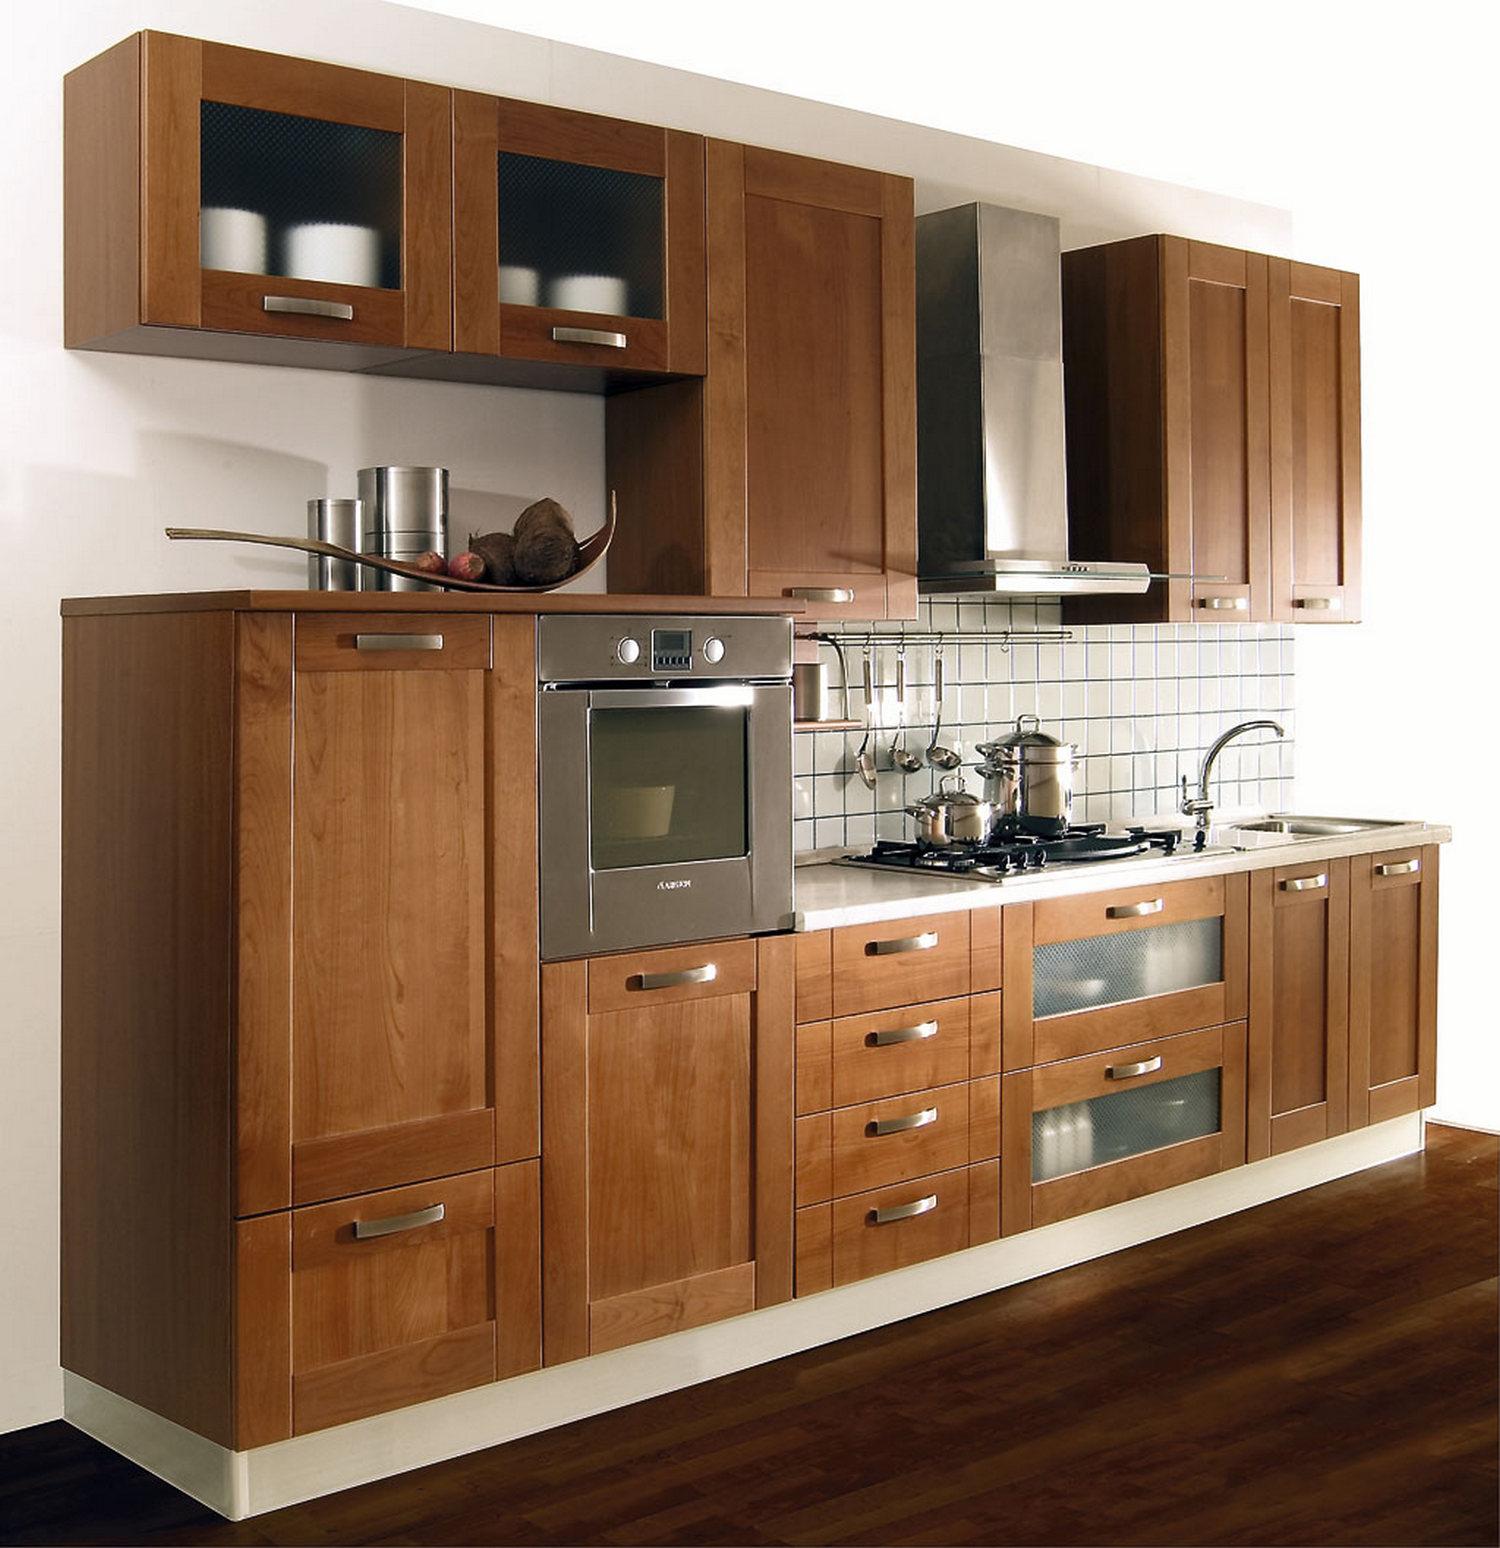 Muebles De Cocina Malaga | Muebles De Cocina En Malaga Cool Cocina ...